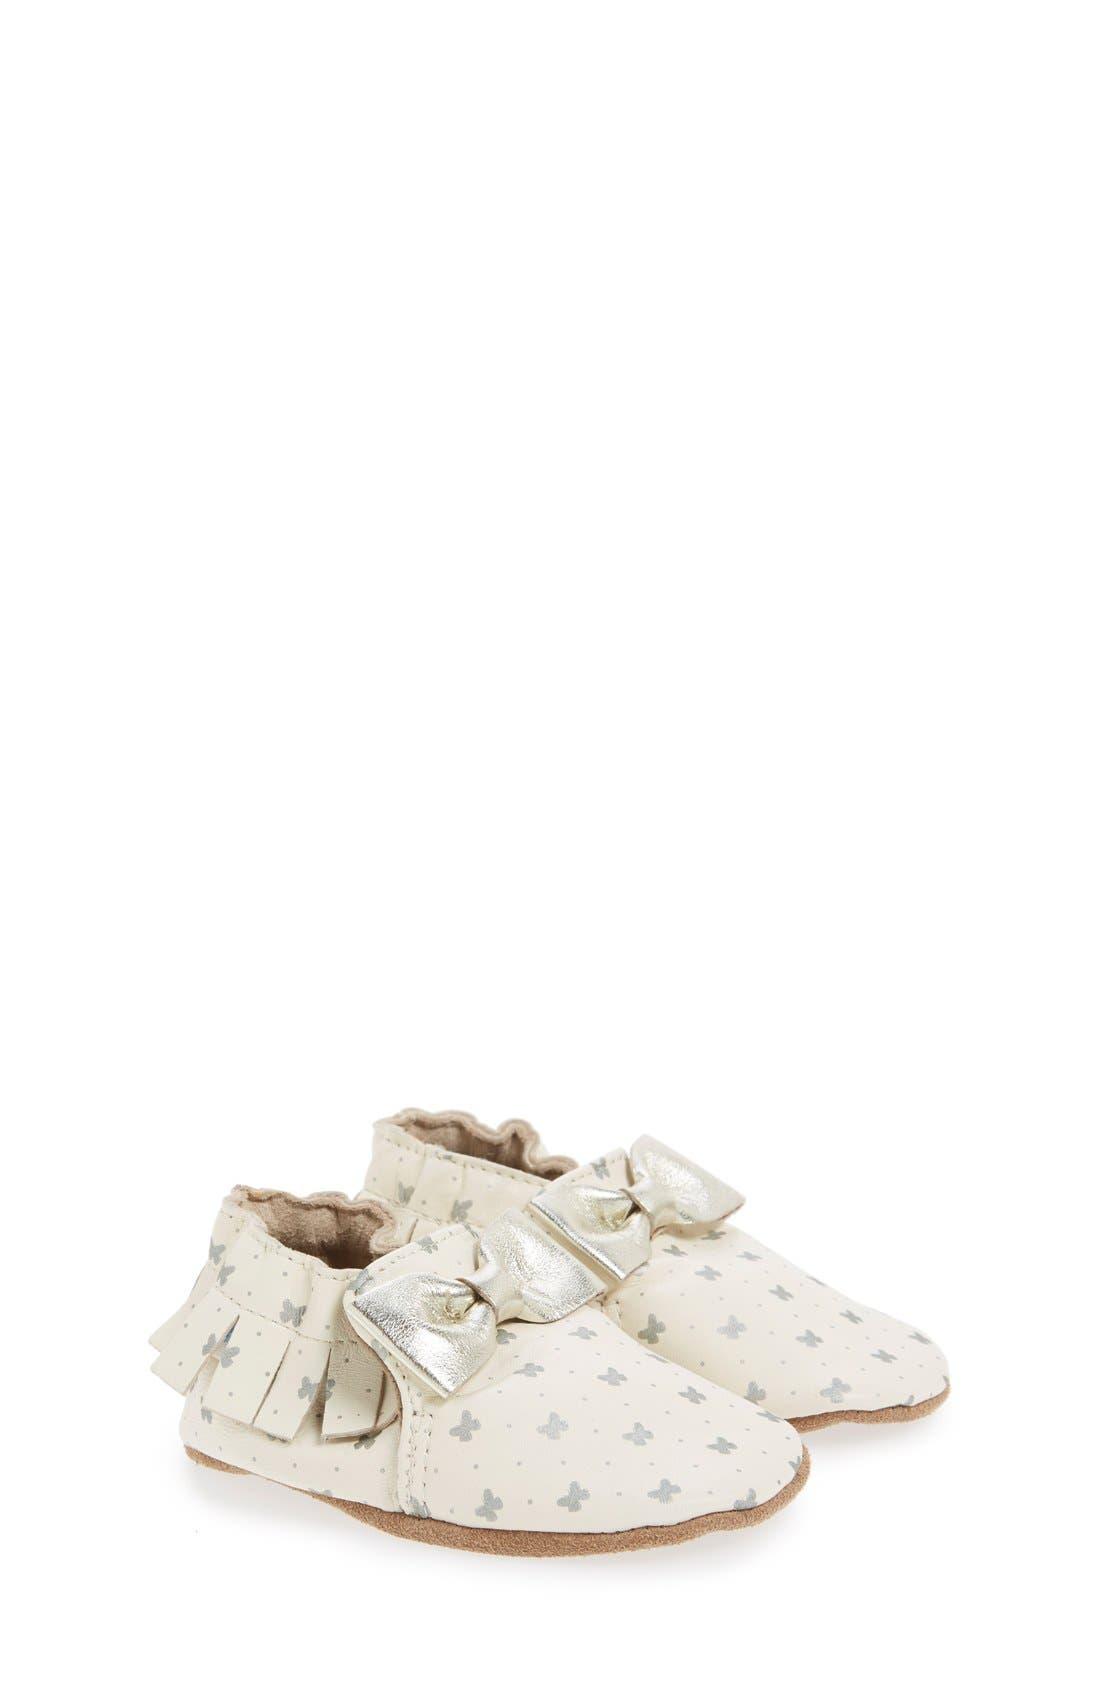 Main Image - Robeez® 'Maggie Moccasin' Crib Shoe (Baby & Walker)